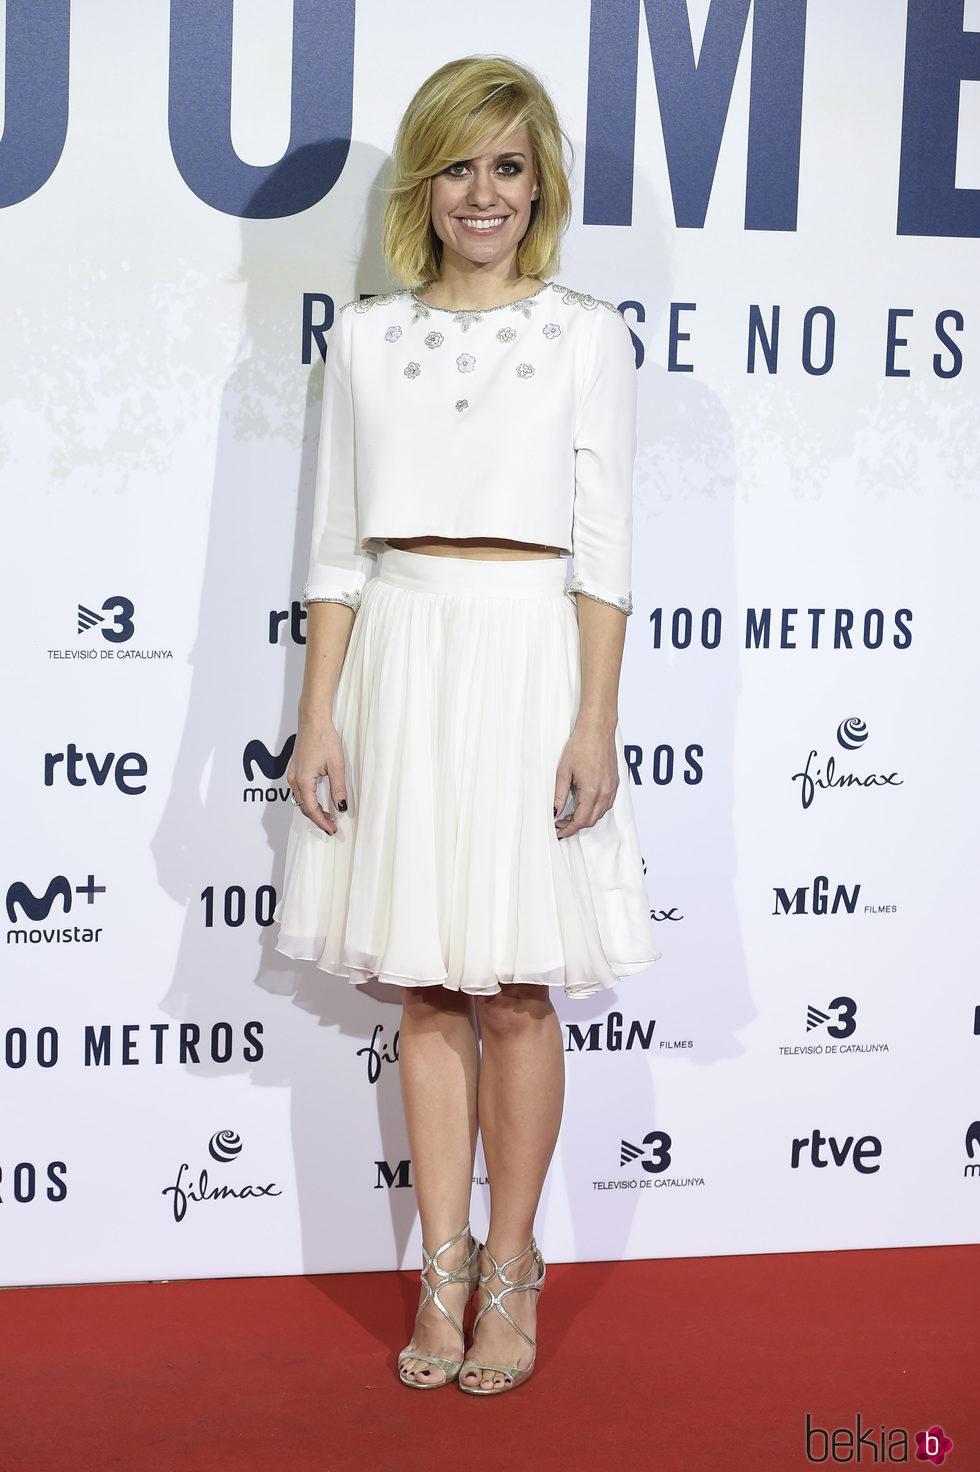 Alexandra Jiménez en el estreno de '100 metros' en Madrid